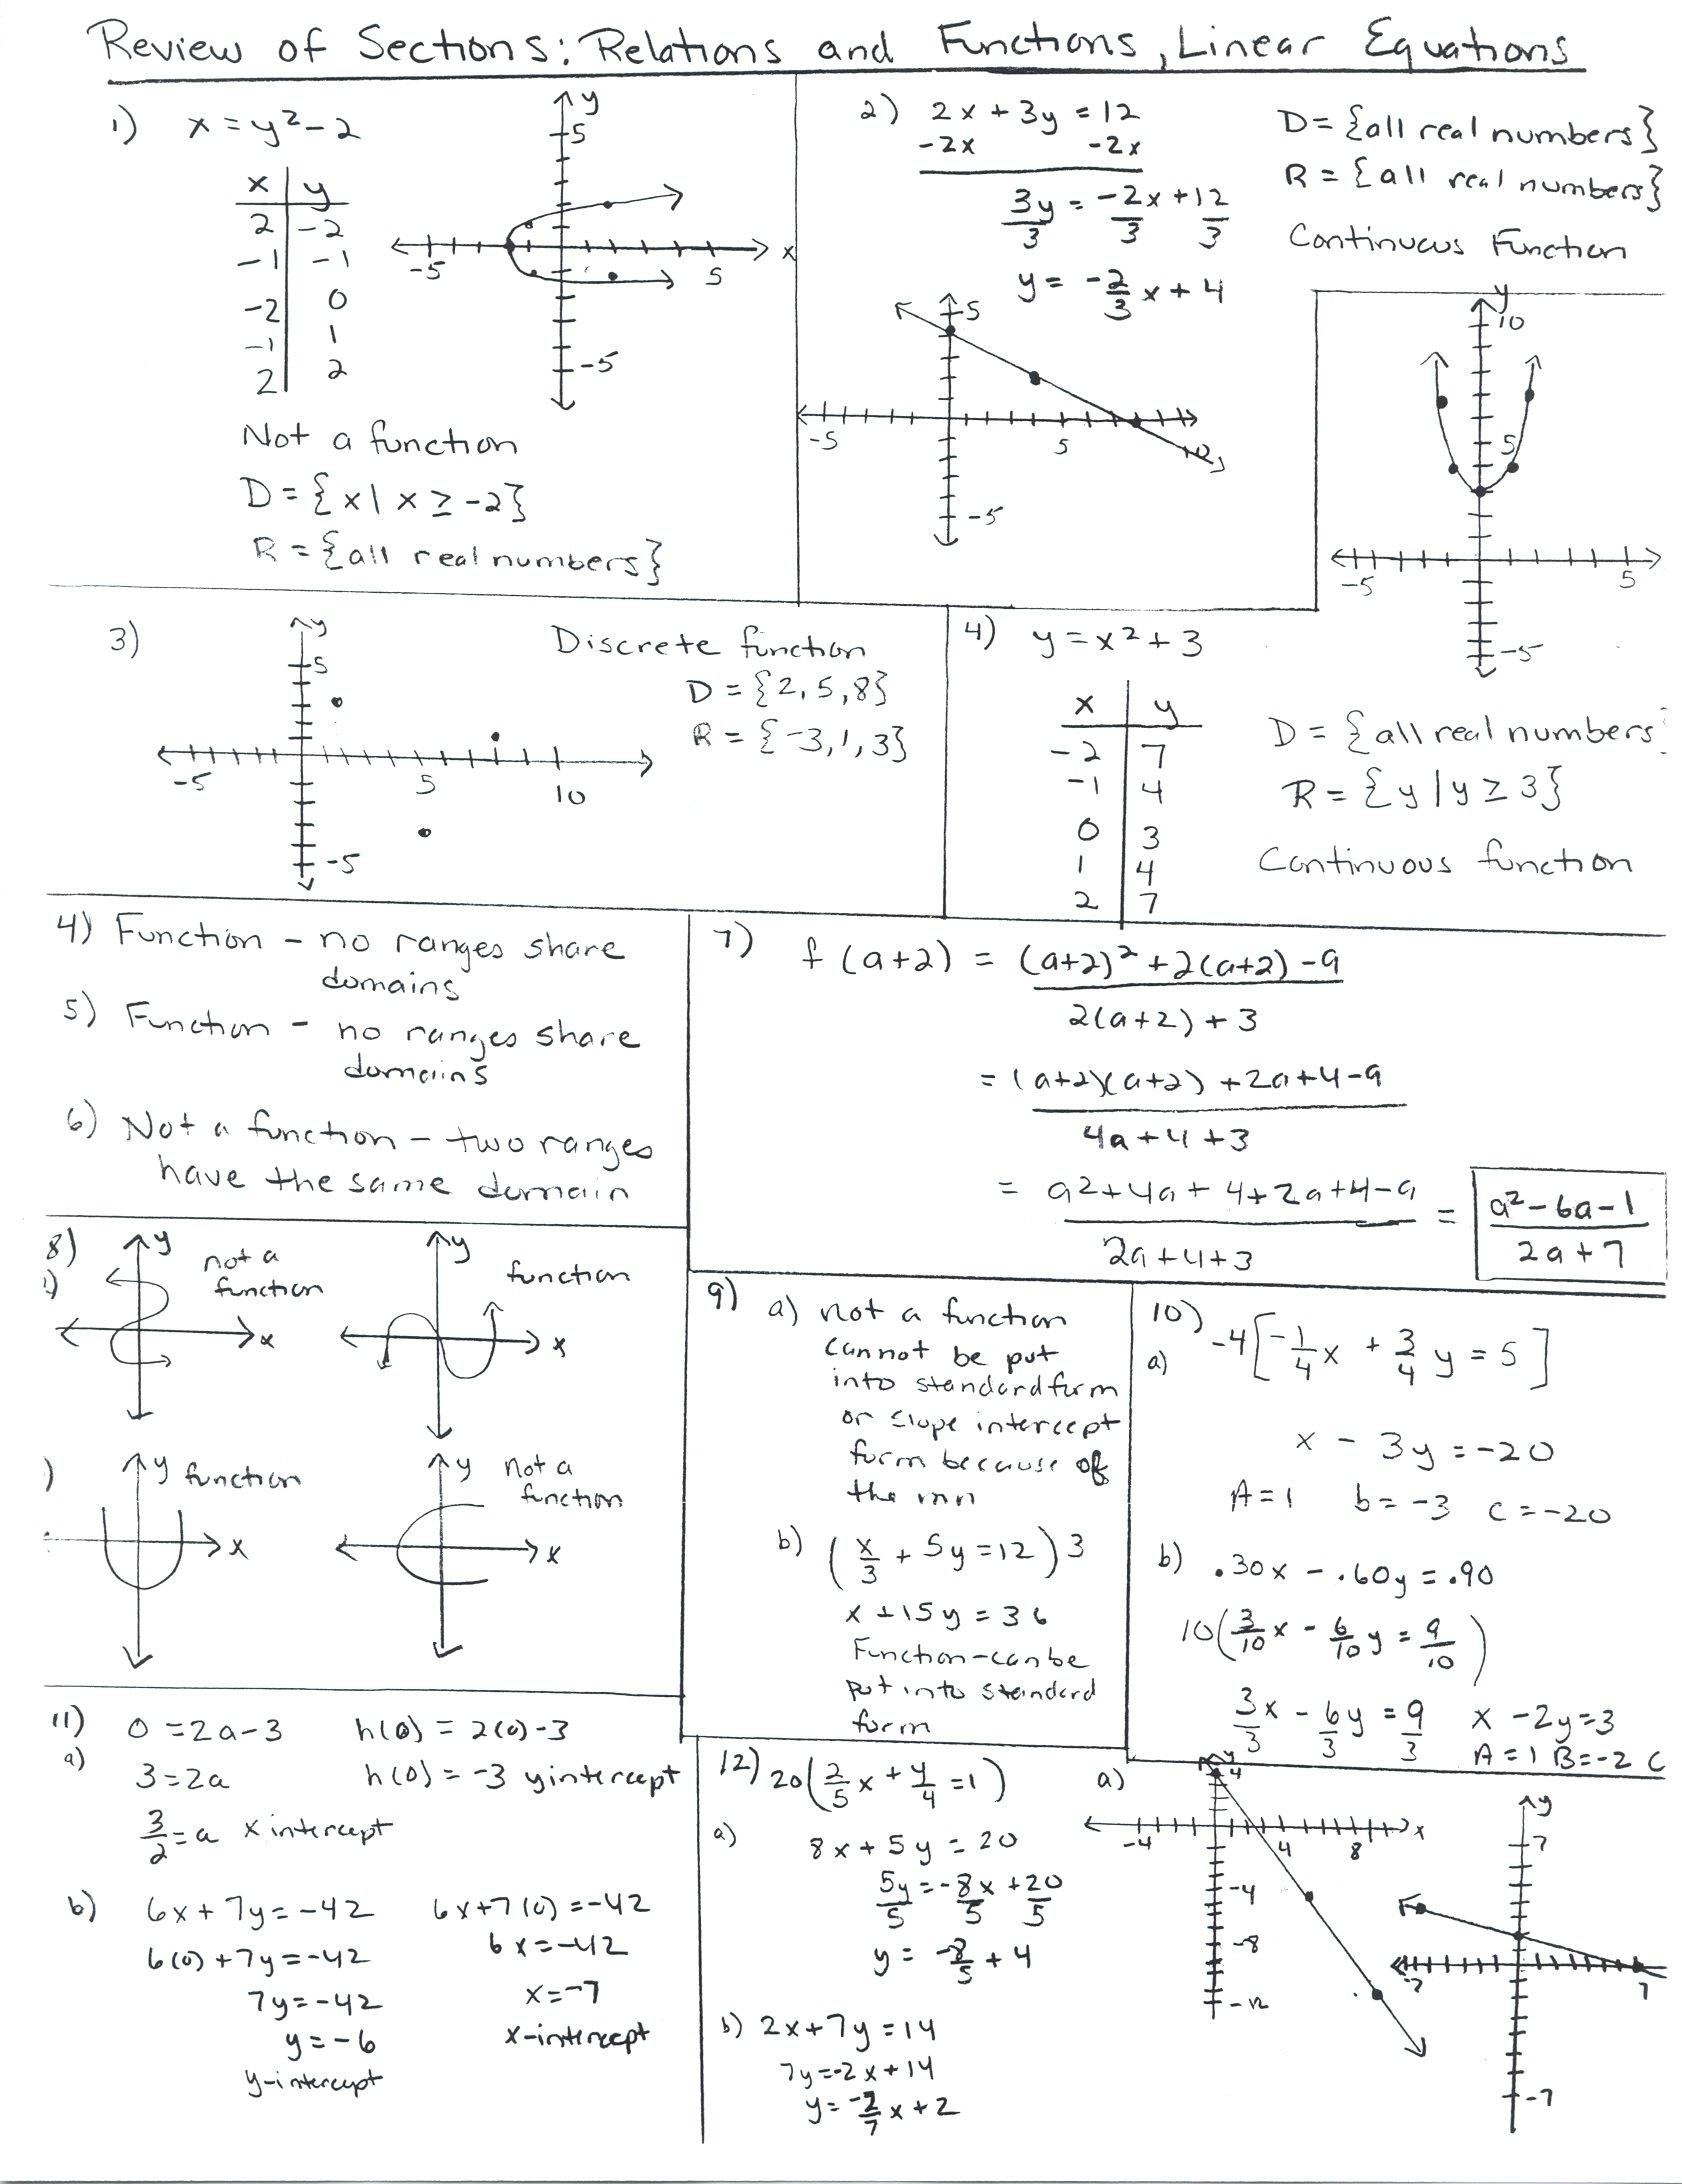 granbyschoolsalgebra2 / Algebra II